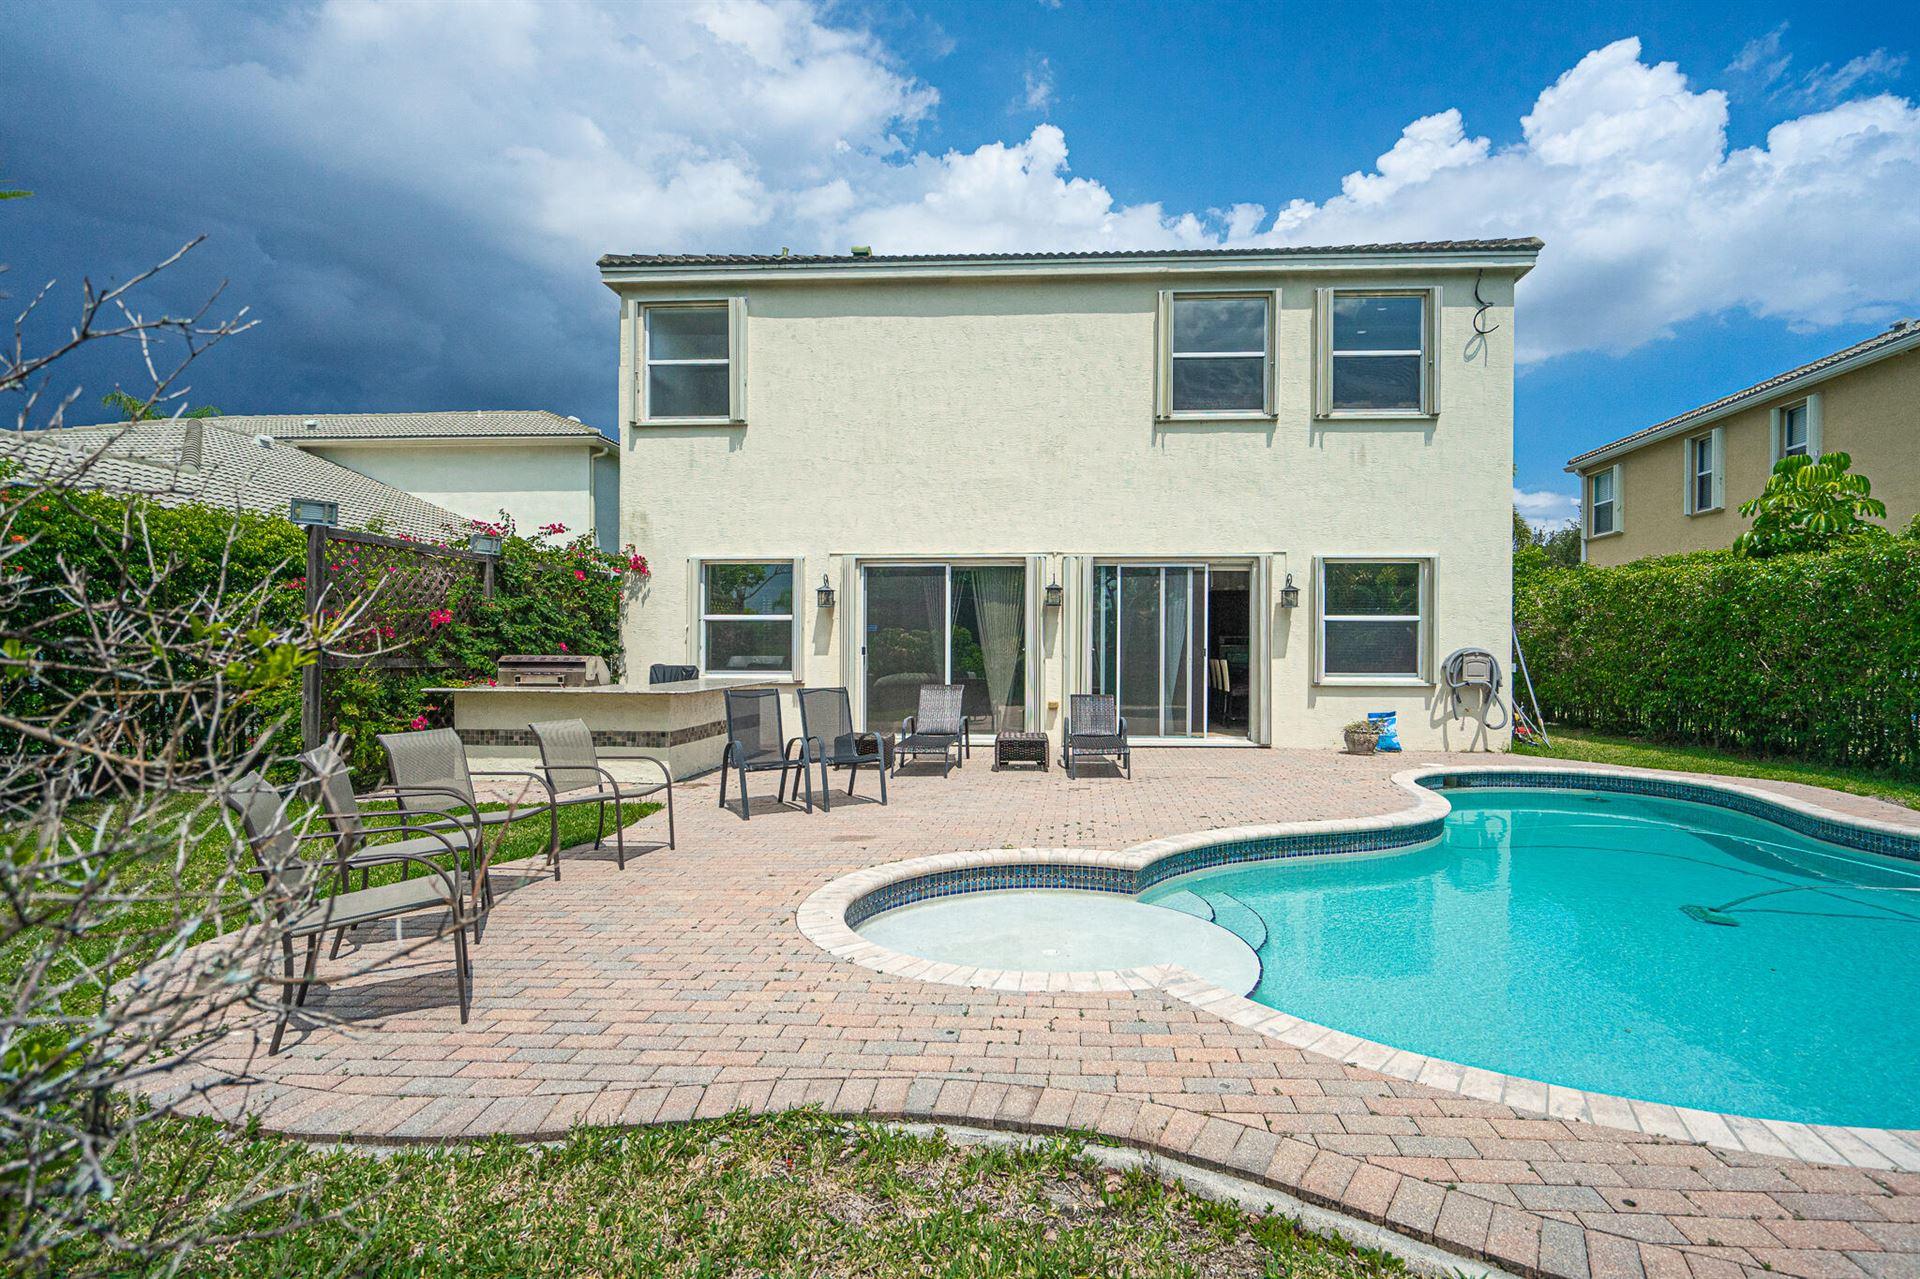 2375 Bellarosa Circle, Royal Palm Beach, FL 33411 - MLS#: RX-10708519